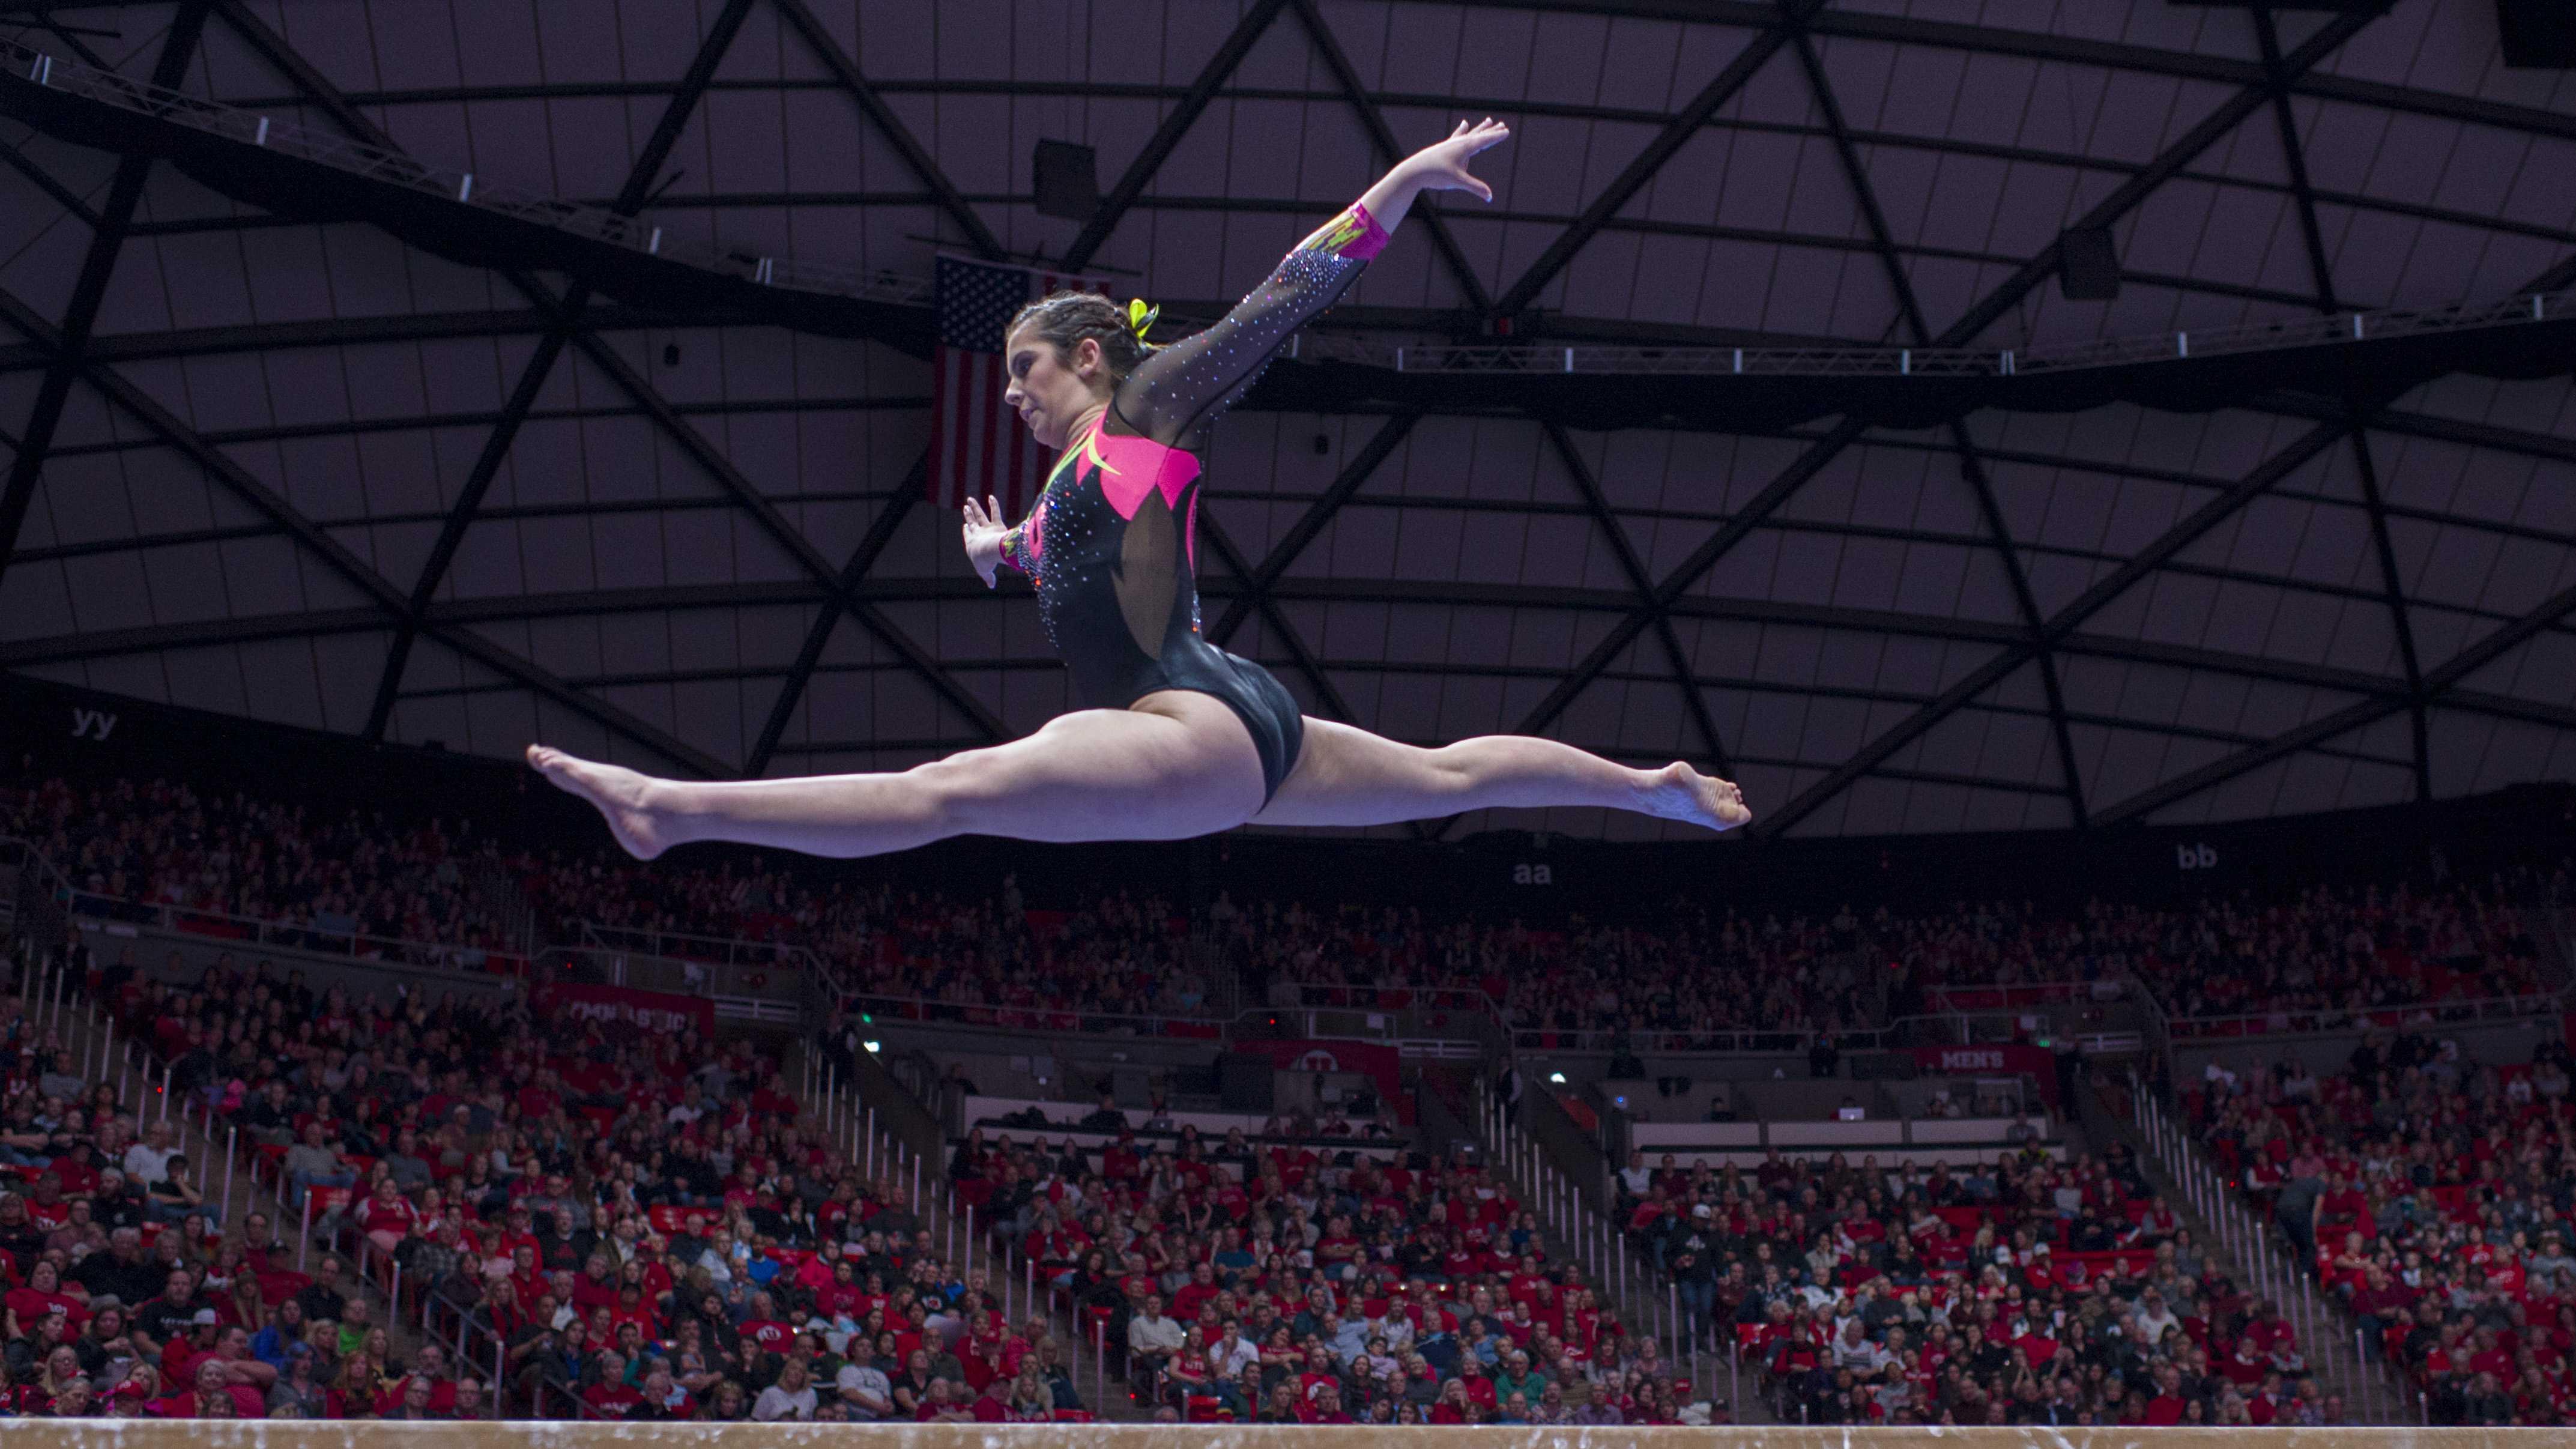 University of Utah women's gymnastics freshman Alexia Burch performs on the balance beam in a dual meet vs. The Oregon State Beavers at the Jon M. Huntsman Center in Salt Lake City, Utah on Friday, Jan. 19, 2018.  (Photo by Kiffer Creveling | The Daily Utah Chronicle)